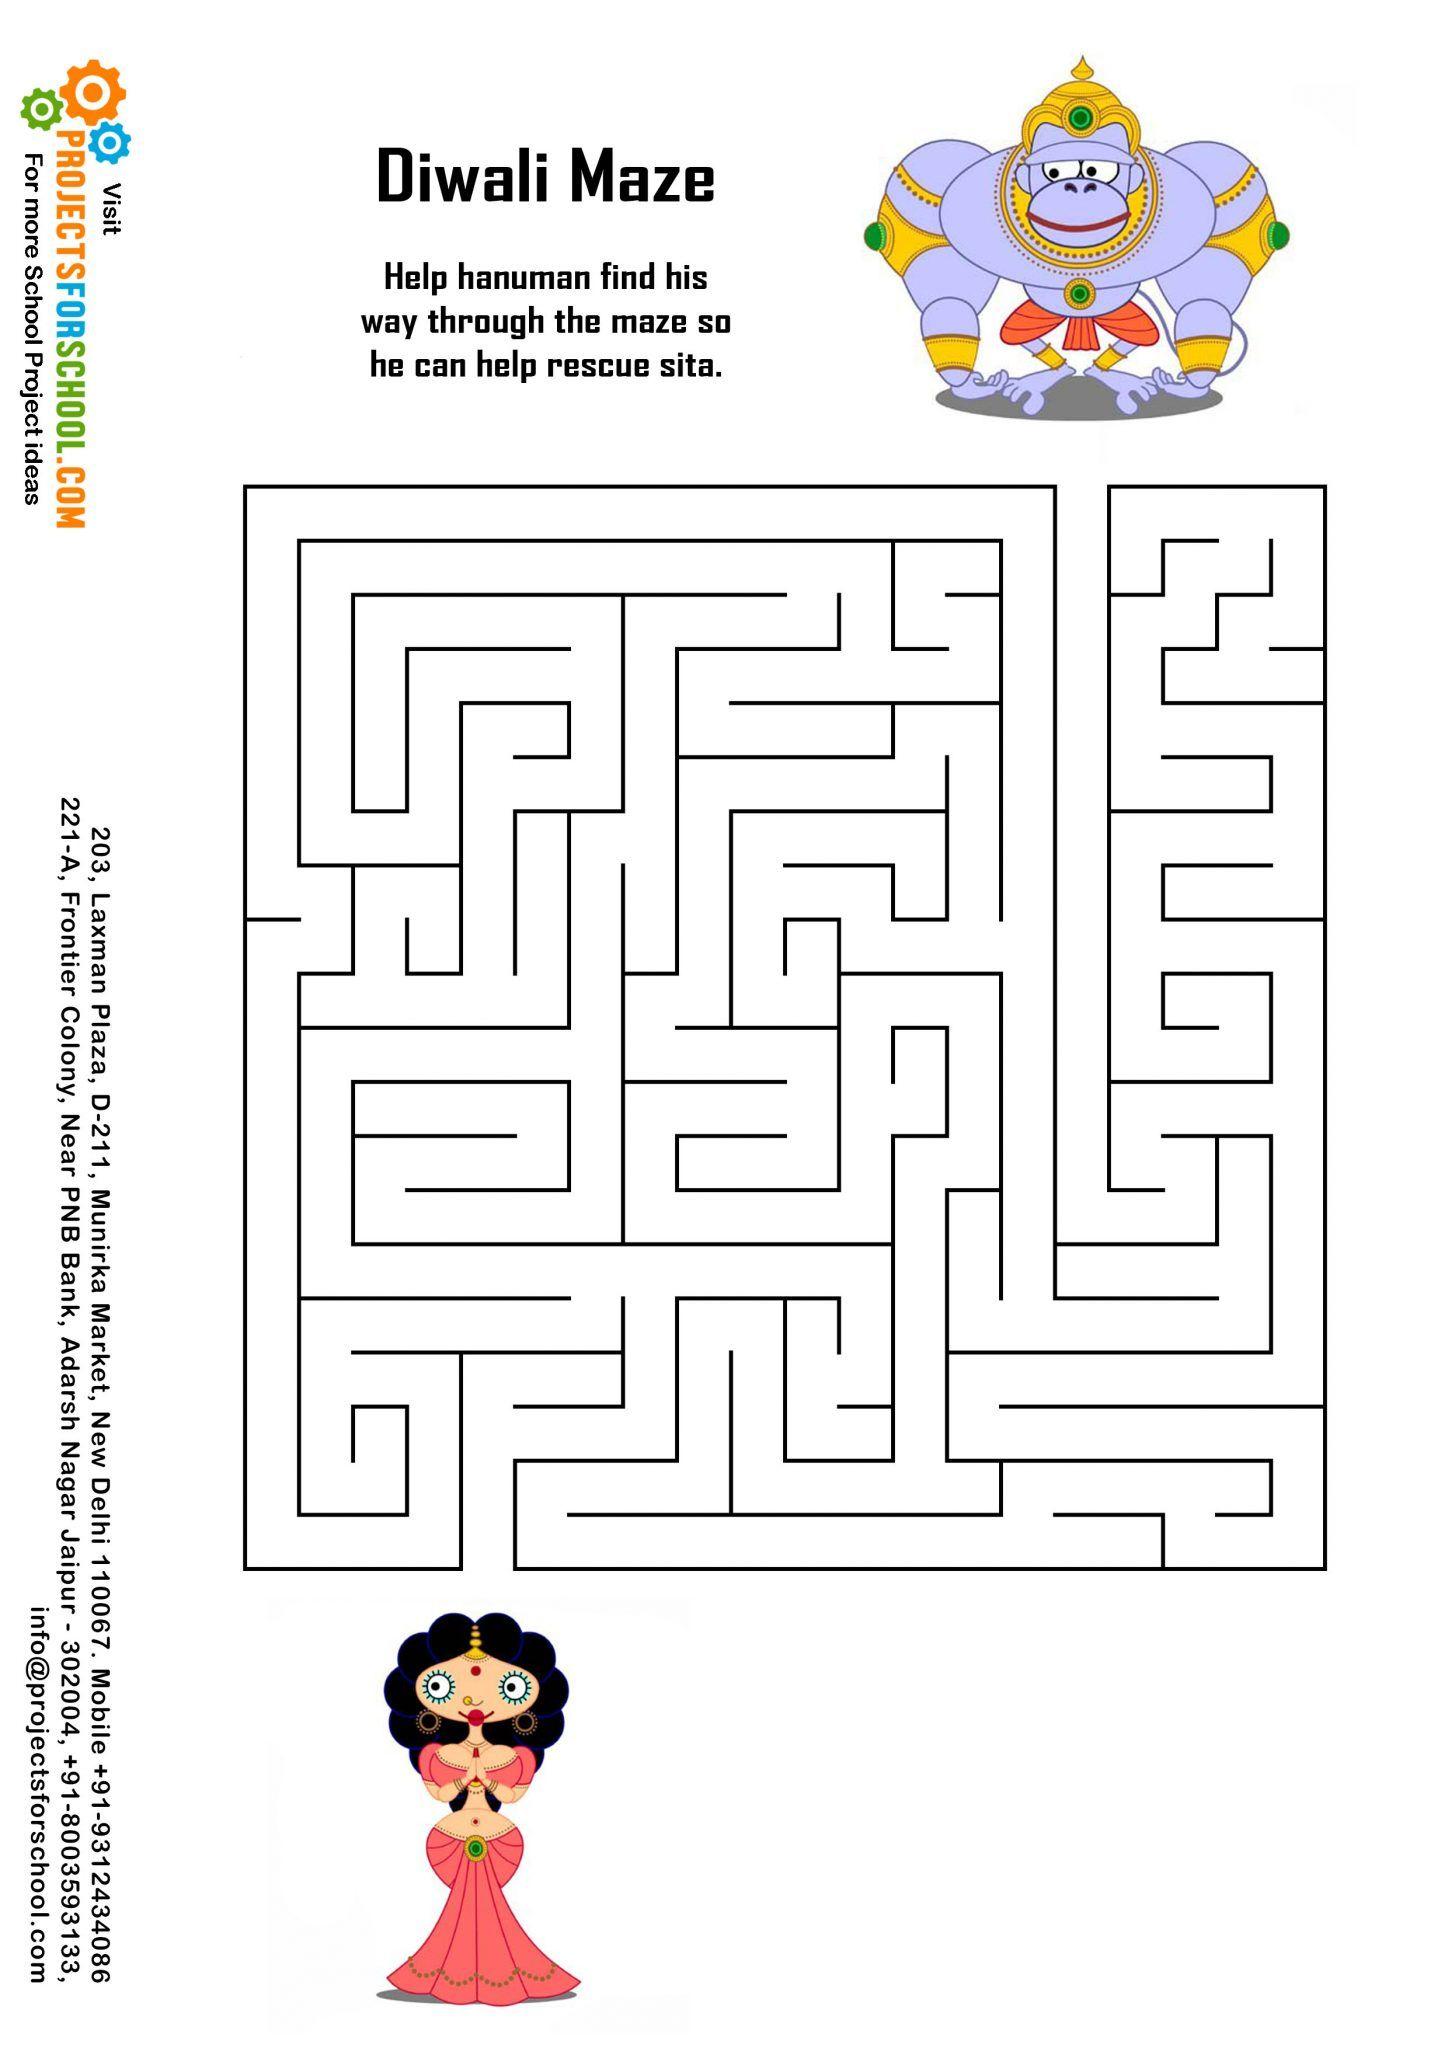 Diwali Maze Free download (With images) Maze worksheet